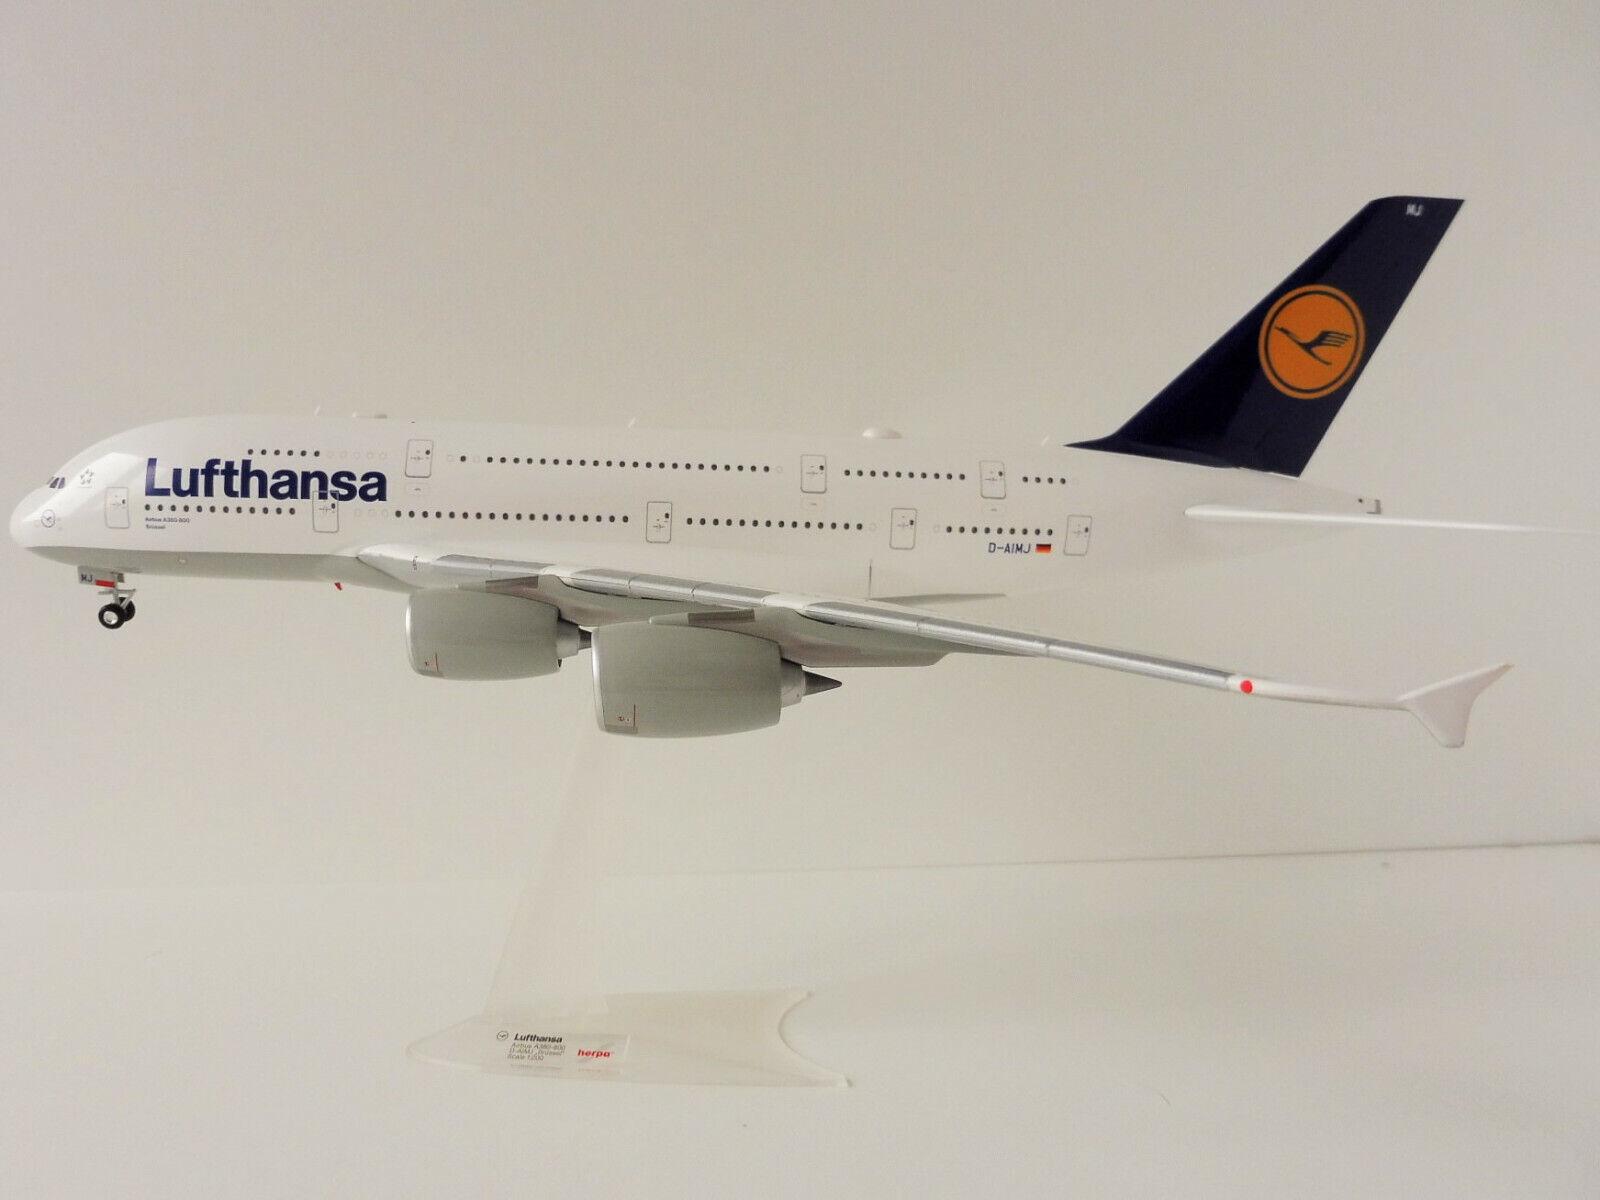 precios razonables Airbus A380-800 Lufthansa Lufthansa Lufthansa 1 200 Herpa 550727-001 A380 a 380 D-Aimj  promociones de descuento